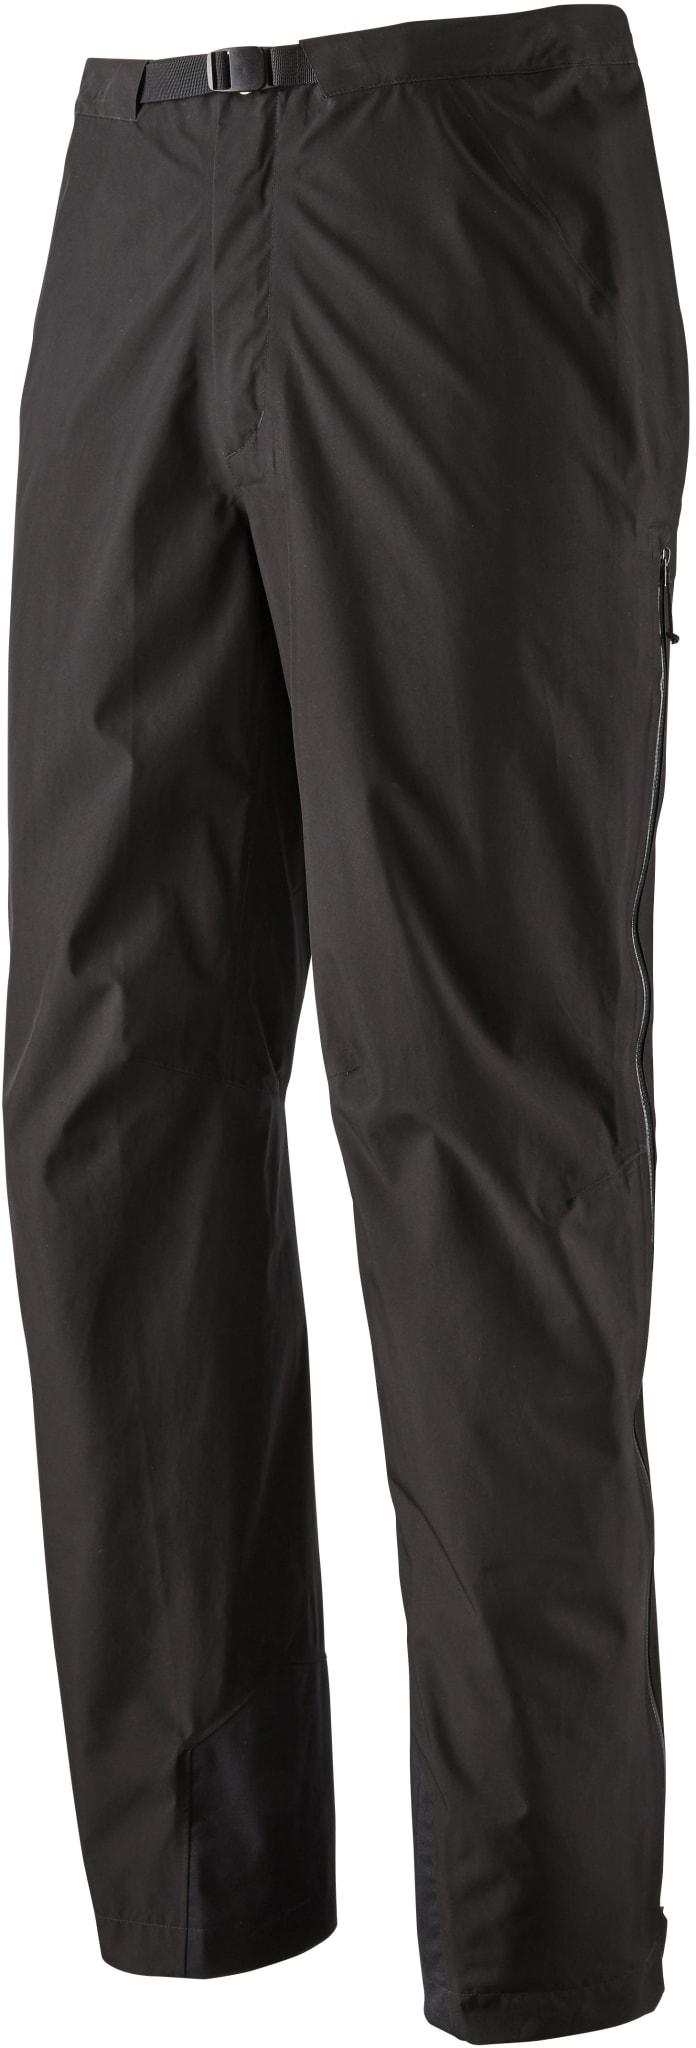 Calcite Pants M